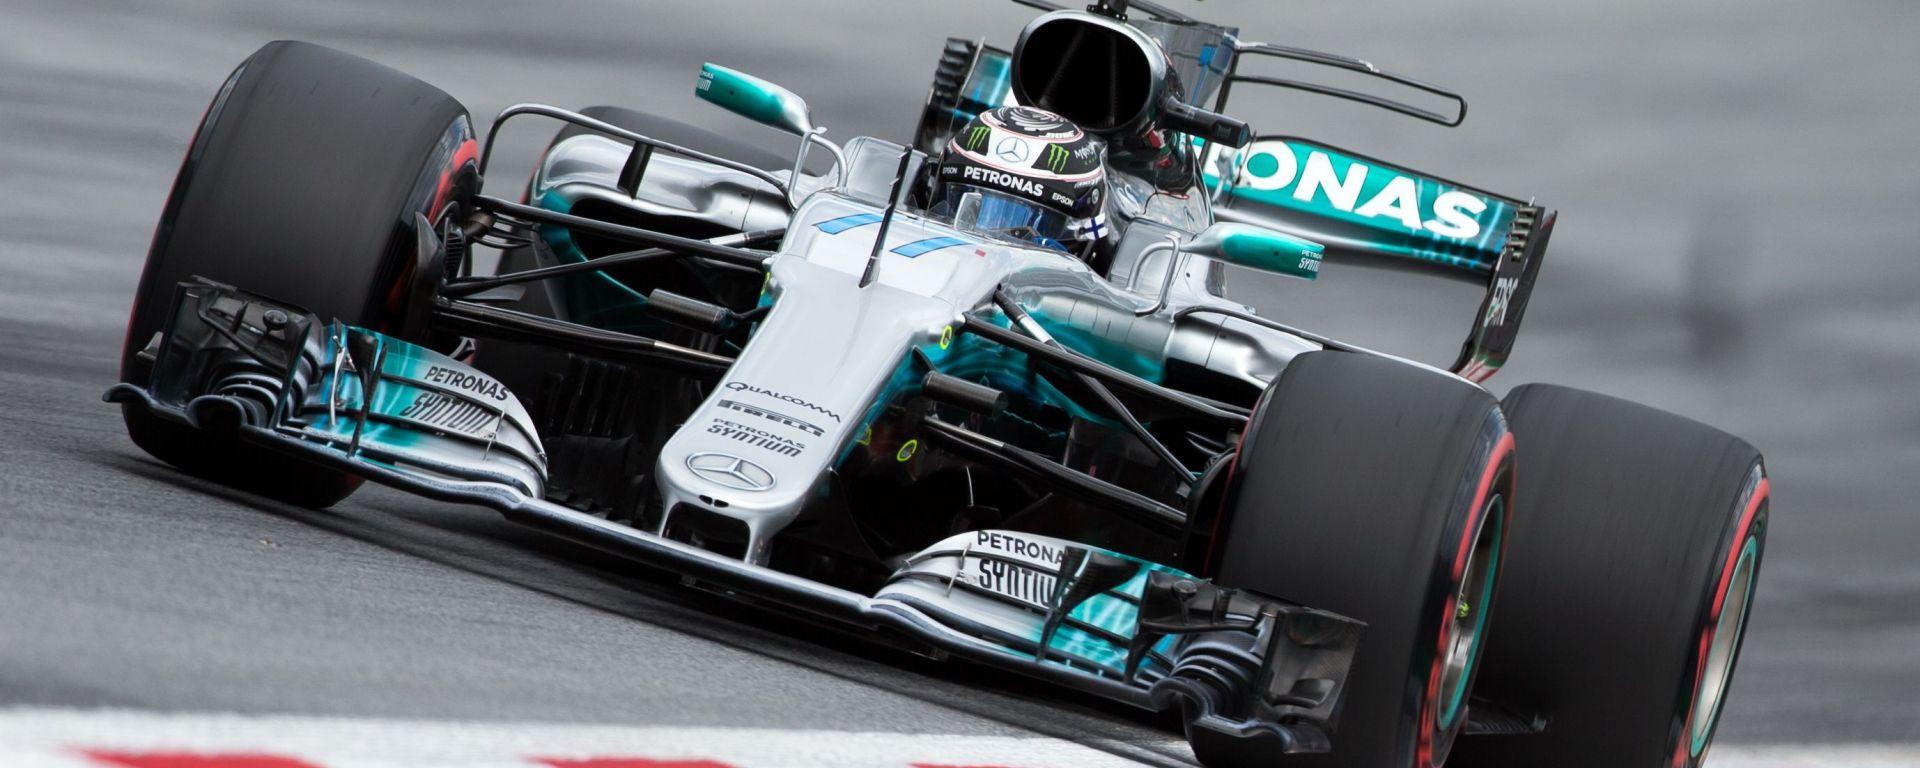 F1 2018 GP Austria